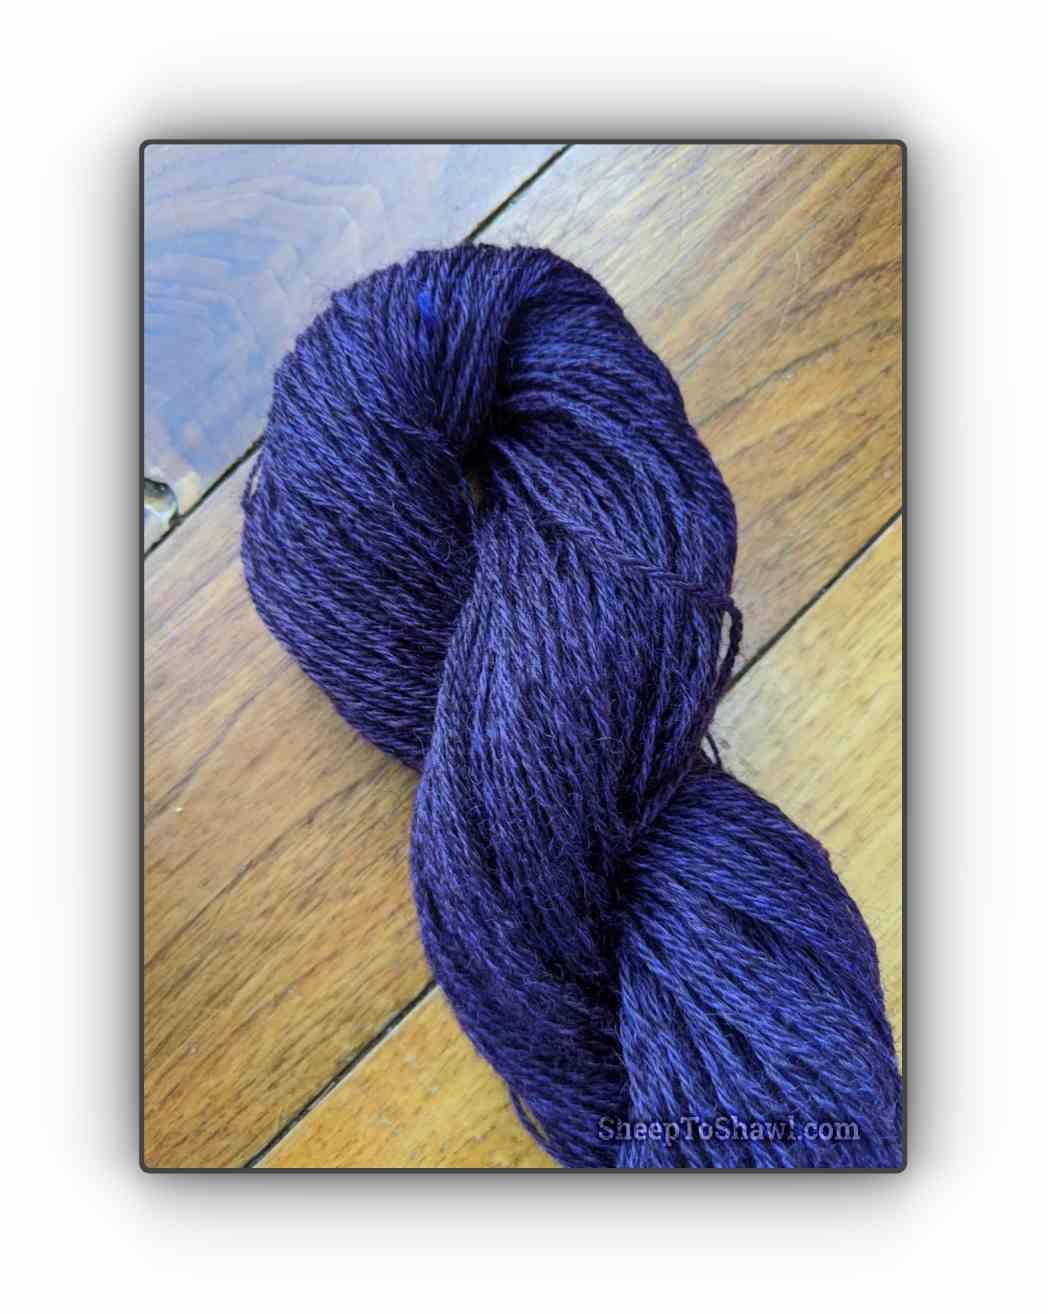 Deep Purple - Snug Valley Coopworth Yarn 1